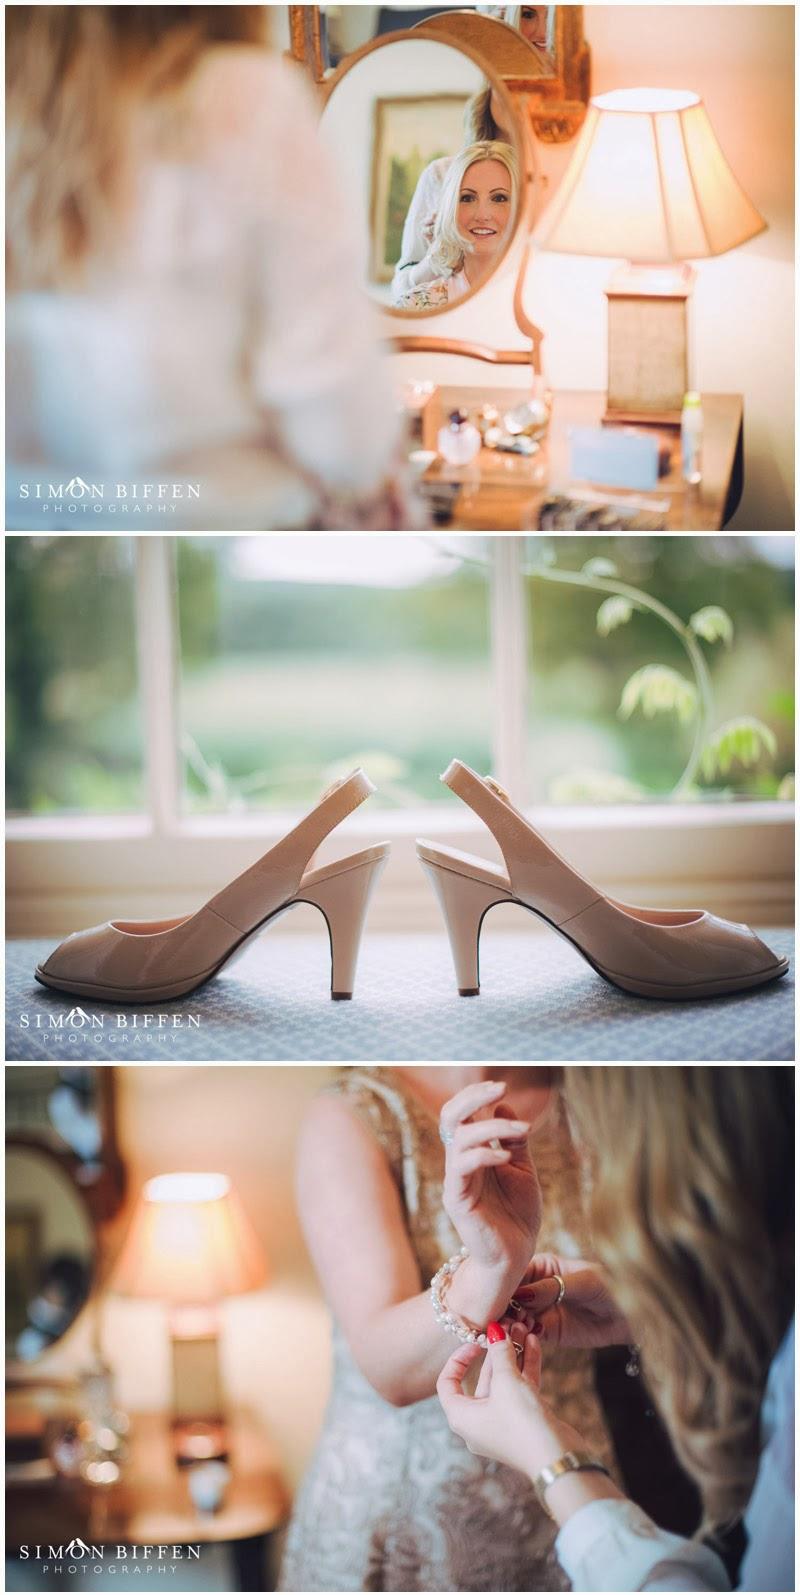 Bride preparation and details